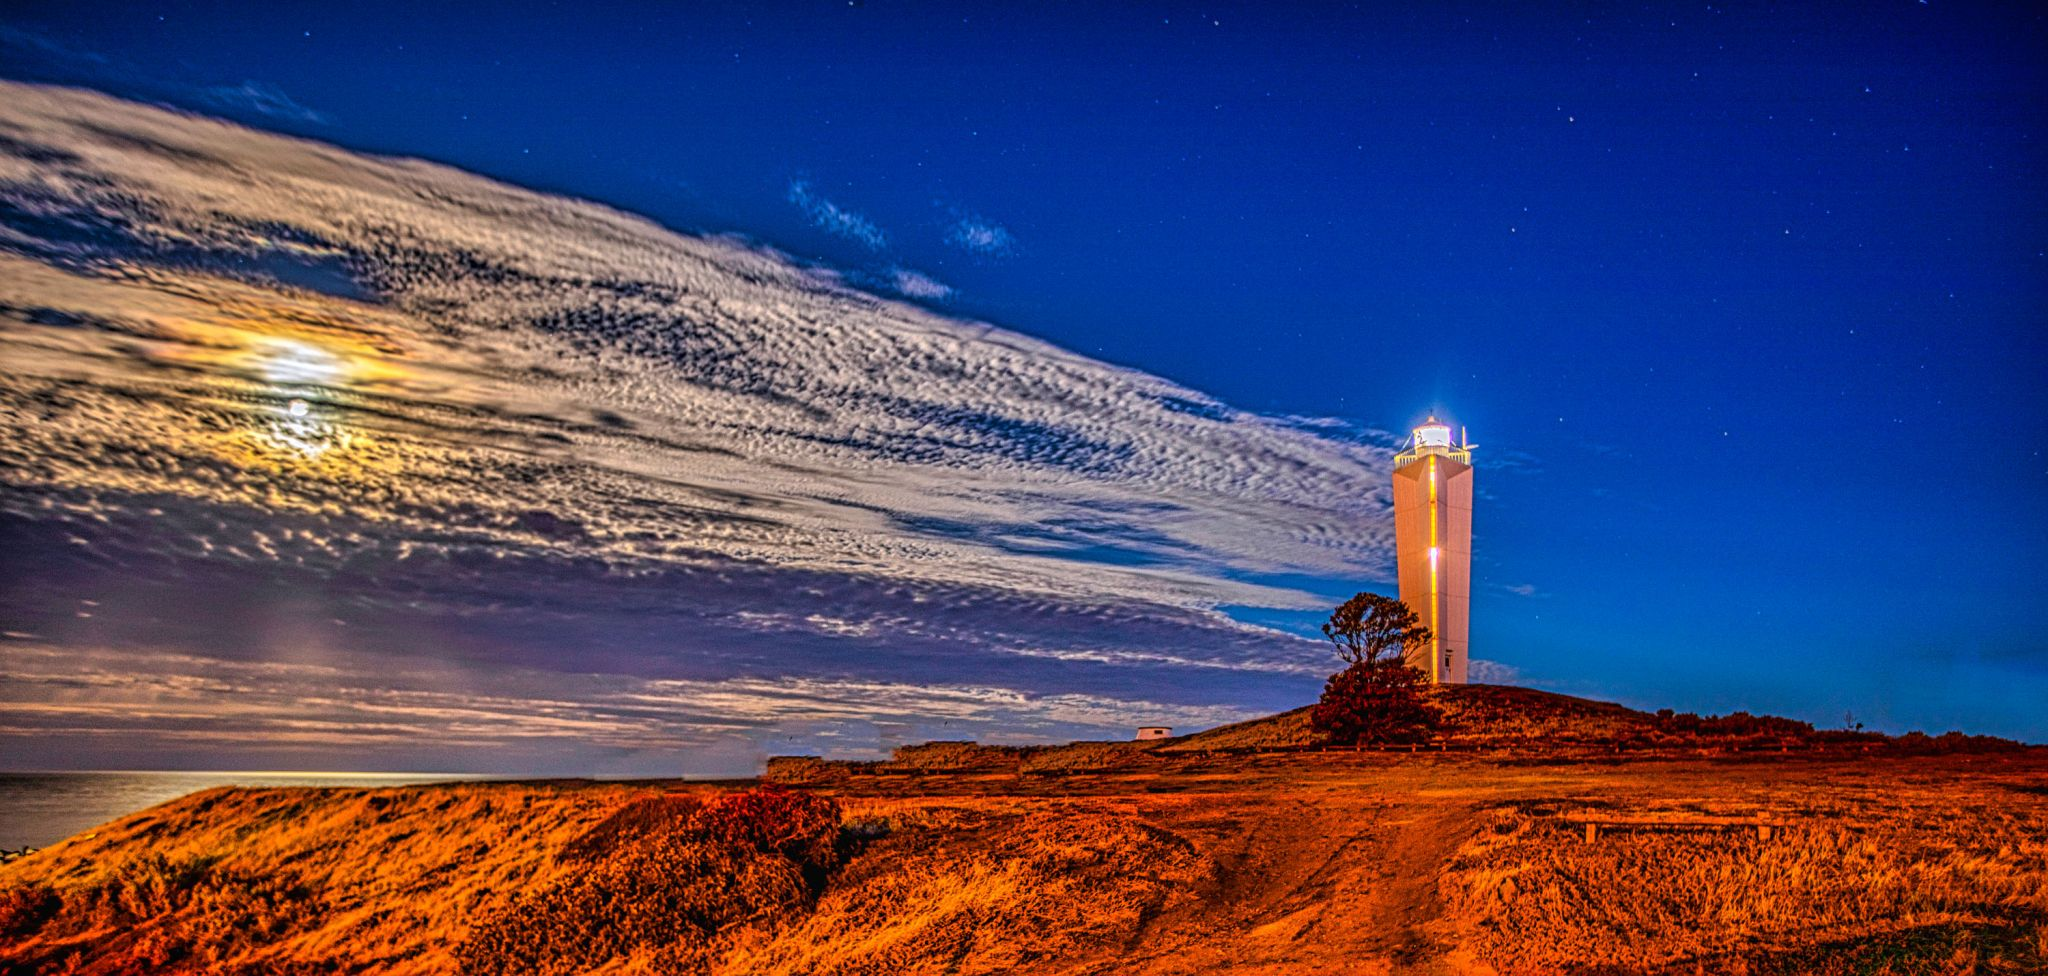 Cape Jervis Lighthouse Moon set South Australia, Australia